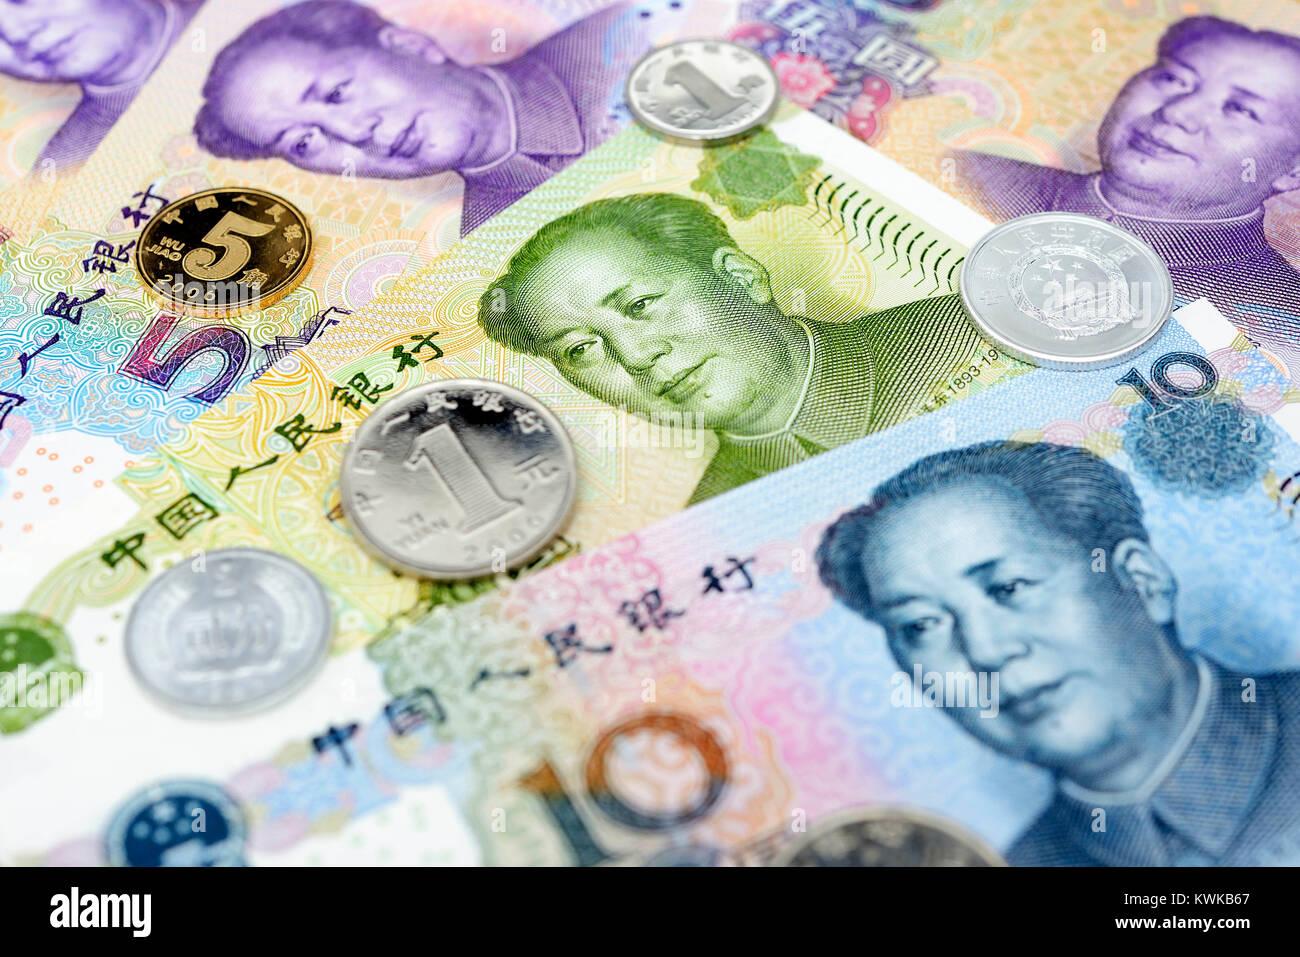 Chinese currency Renminbi, Chinesische W?hrung Renminbi - Stock Image